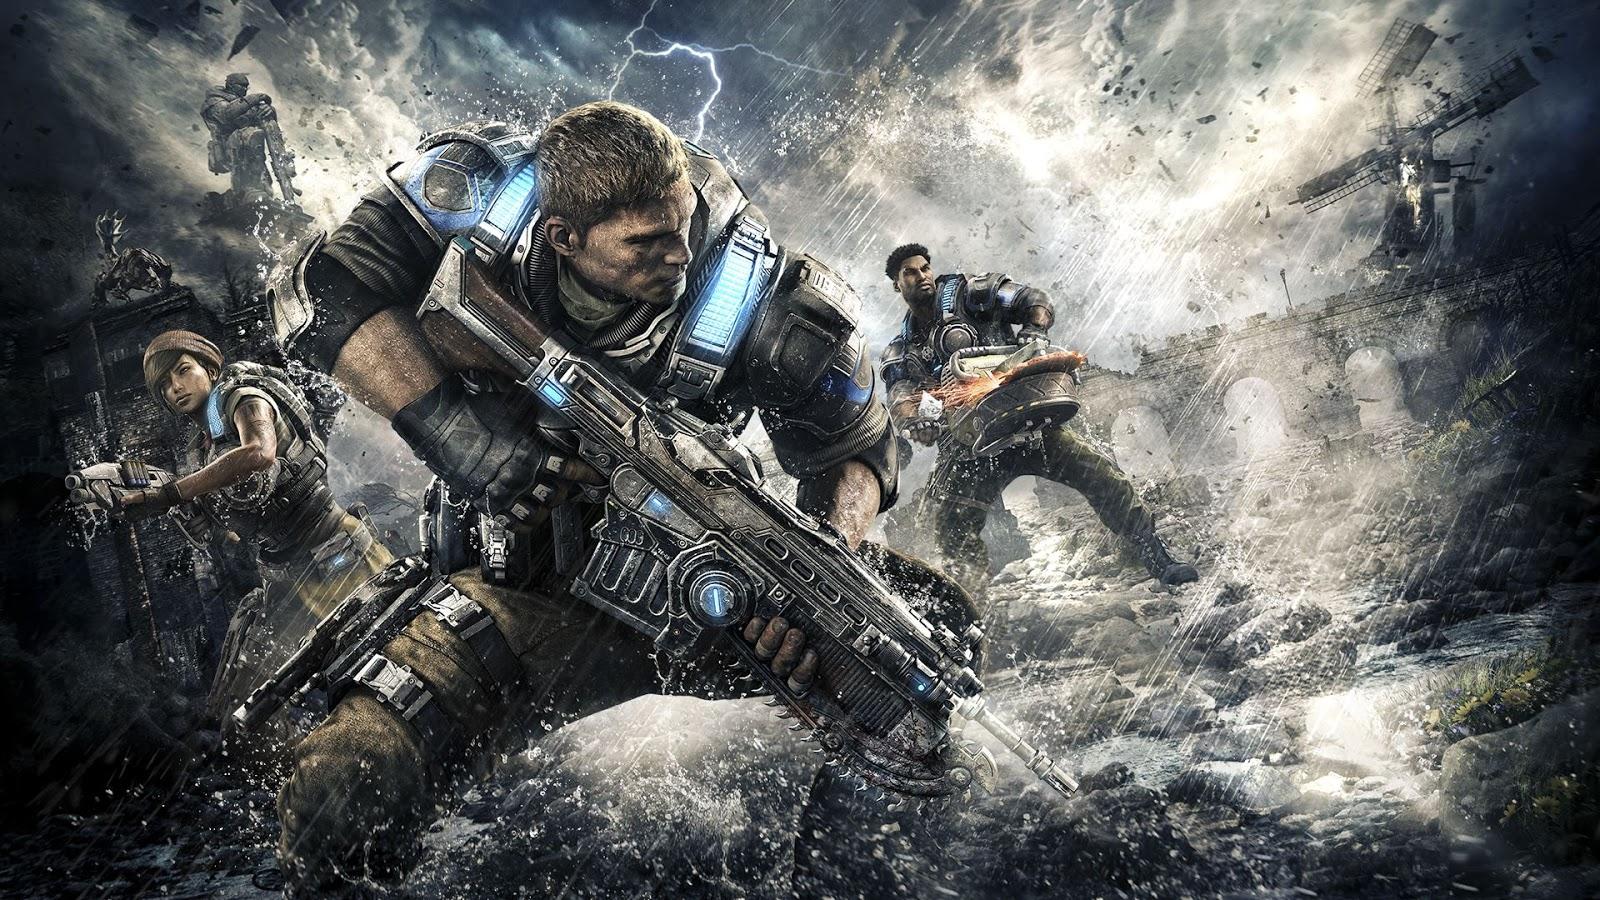 Gears of war setup exe download